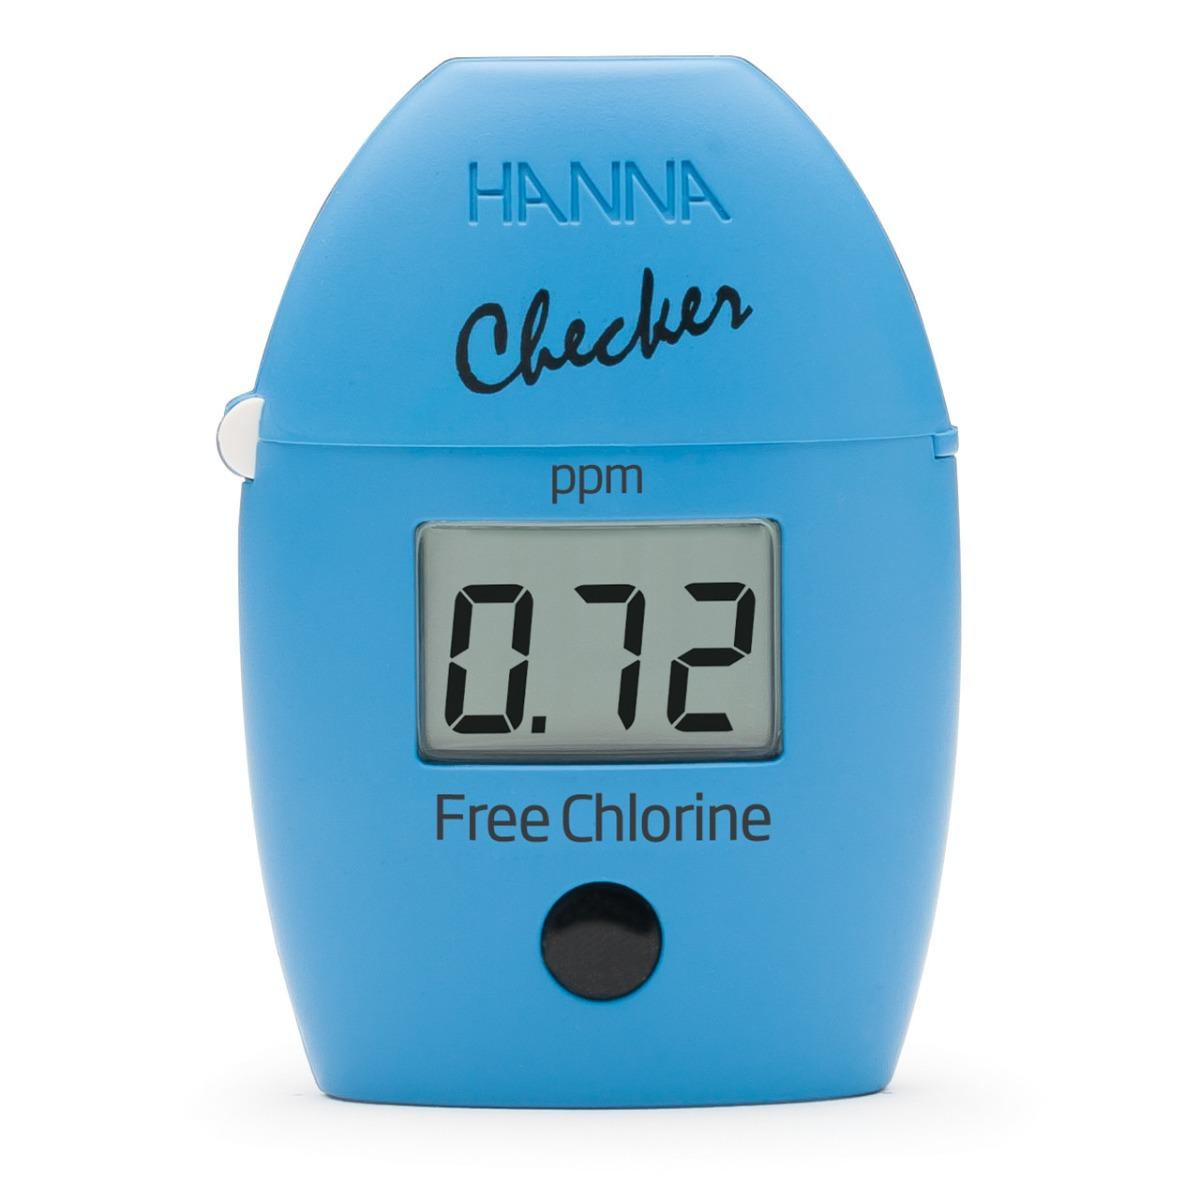 HI701 Free Chlorine Checker® HC Colorimeter